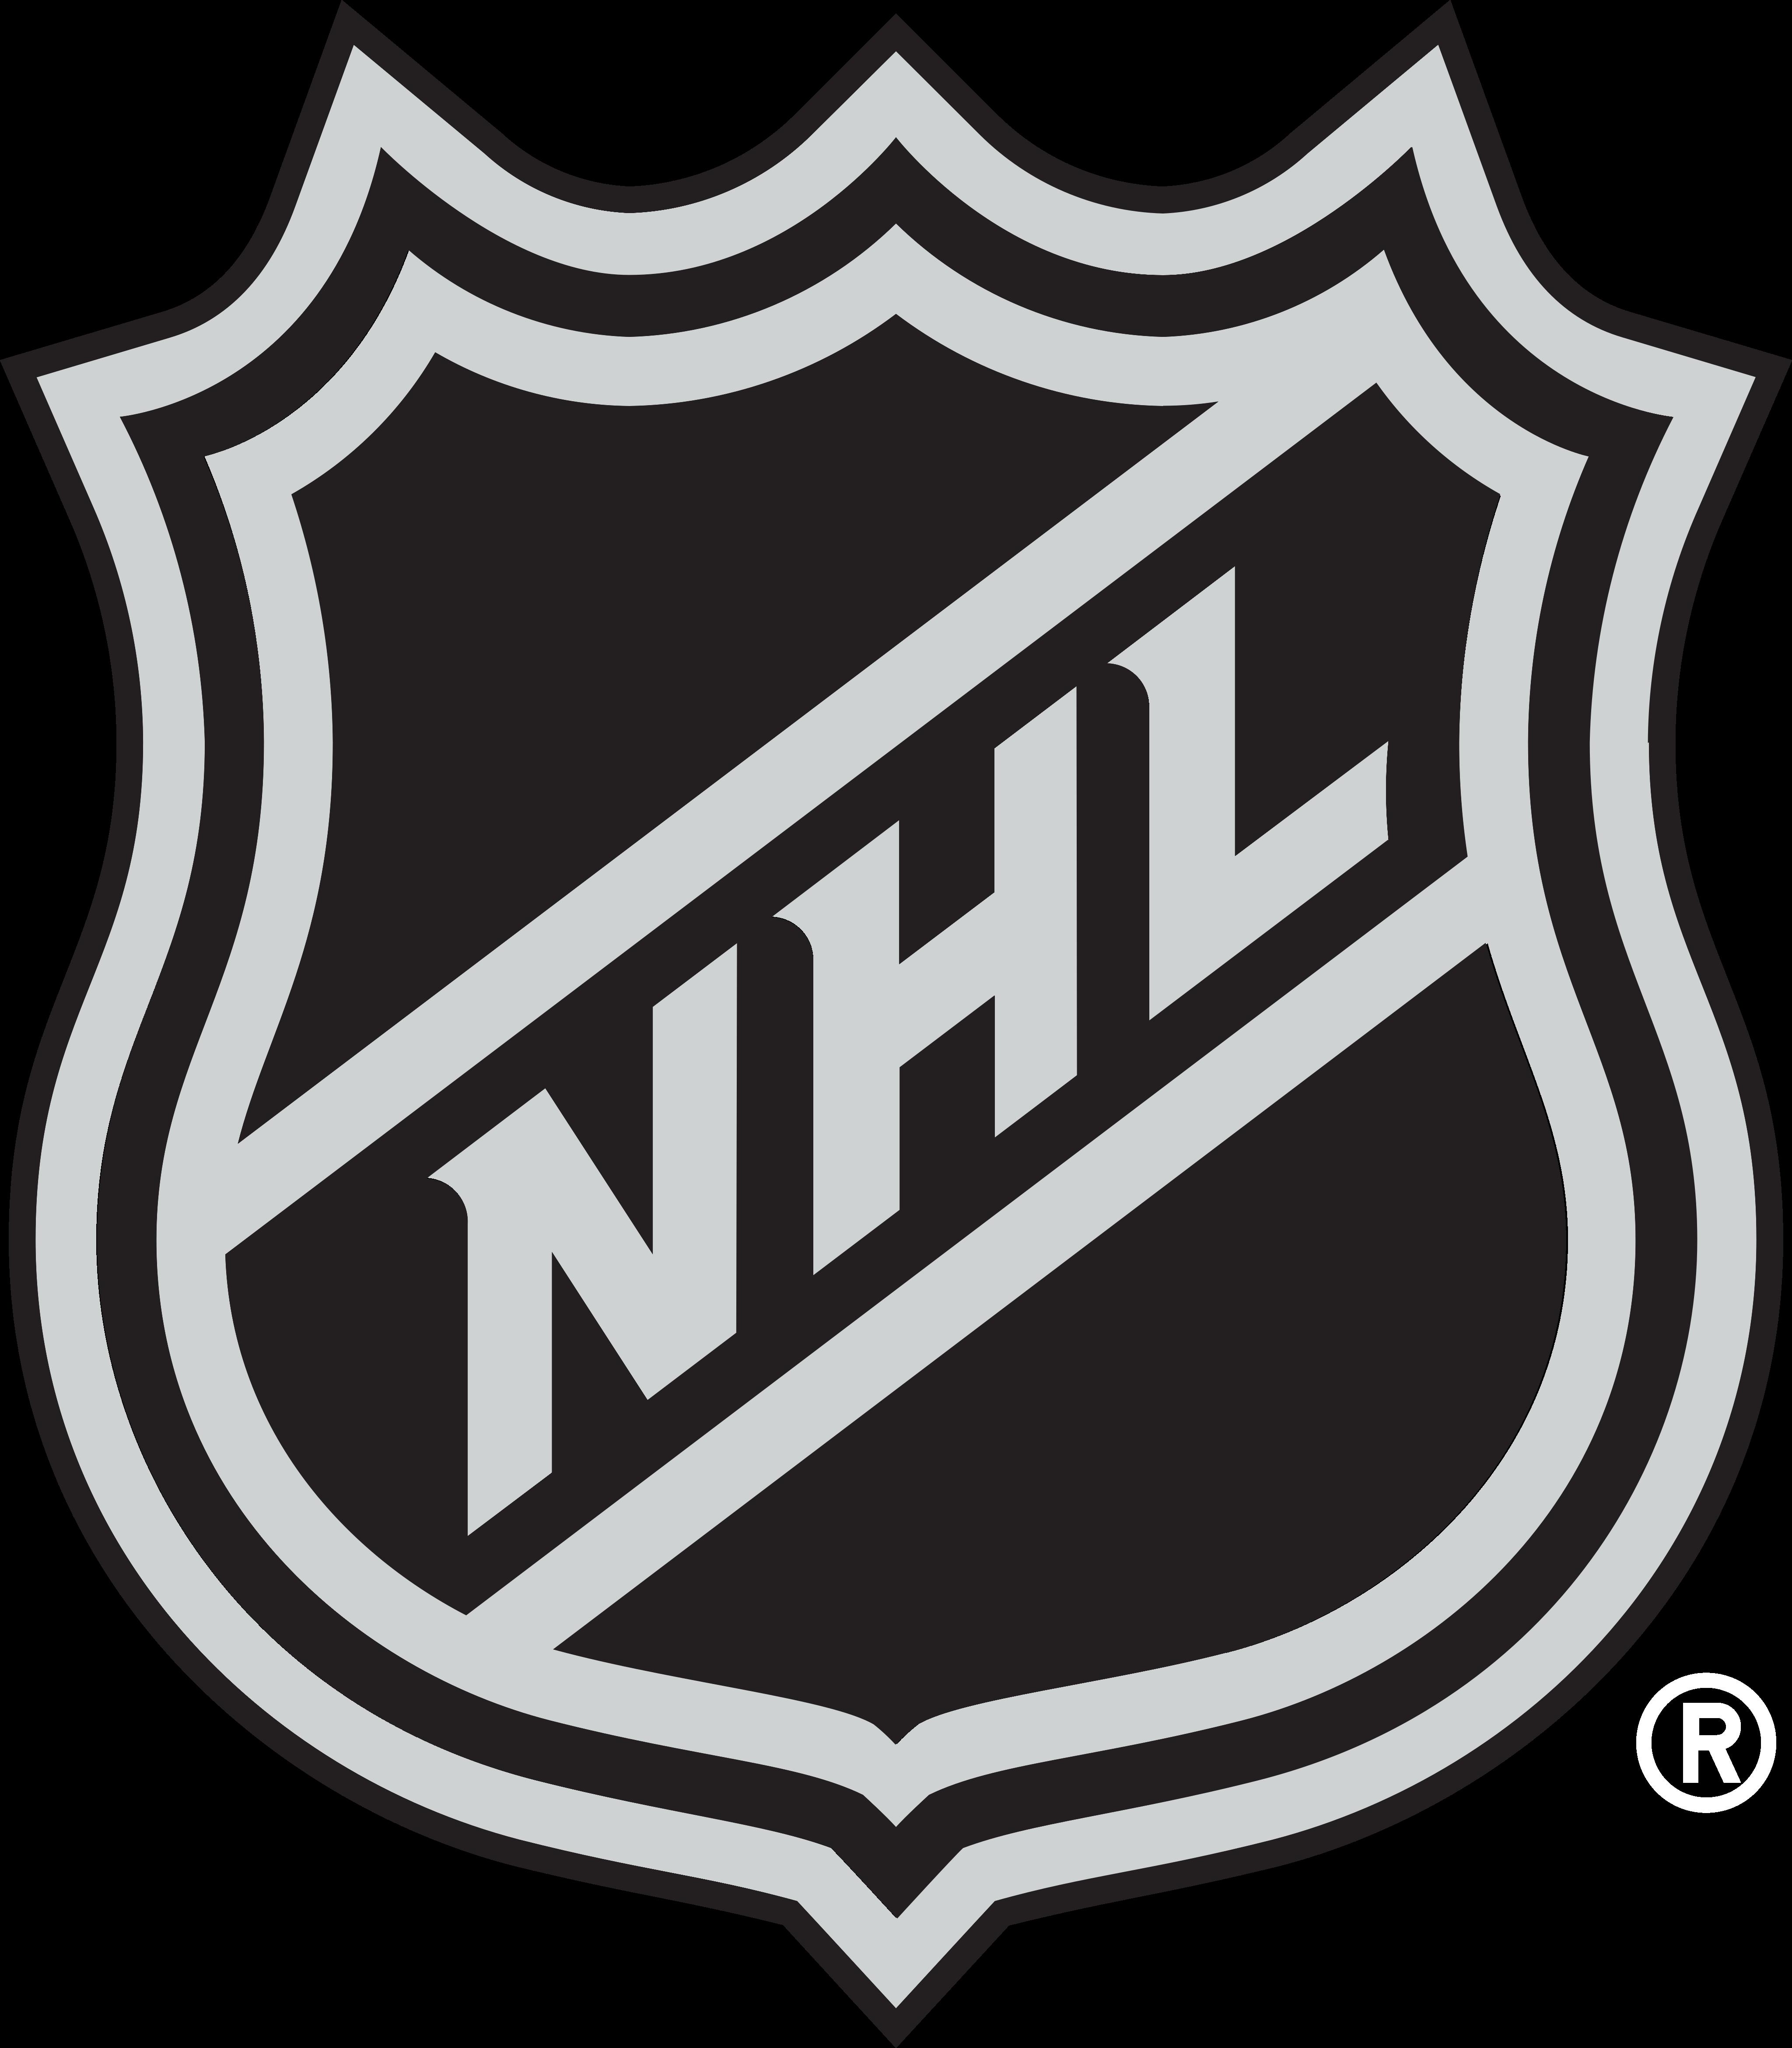 nhl logo - NHL Logo - National Hockey League Logo